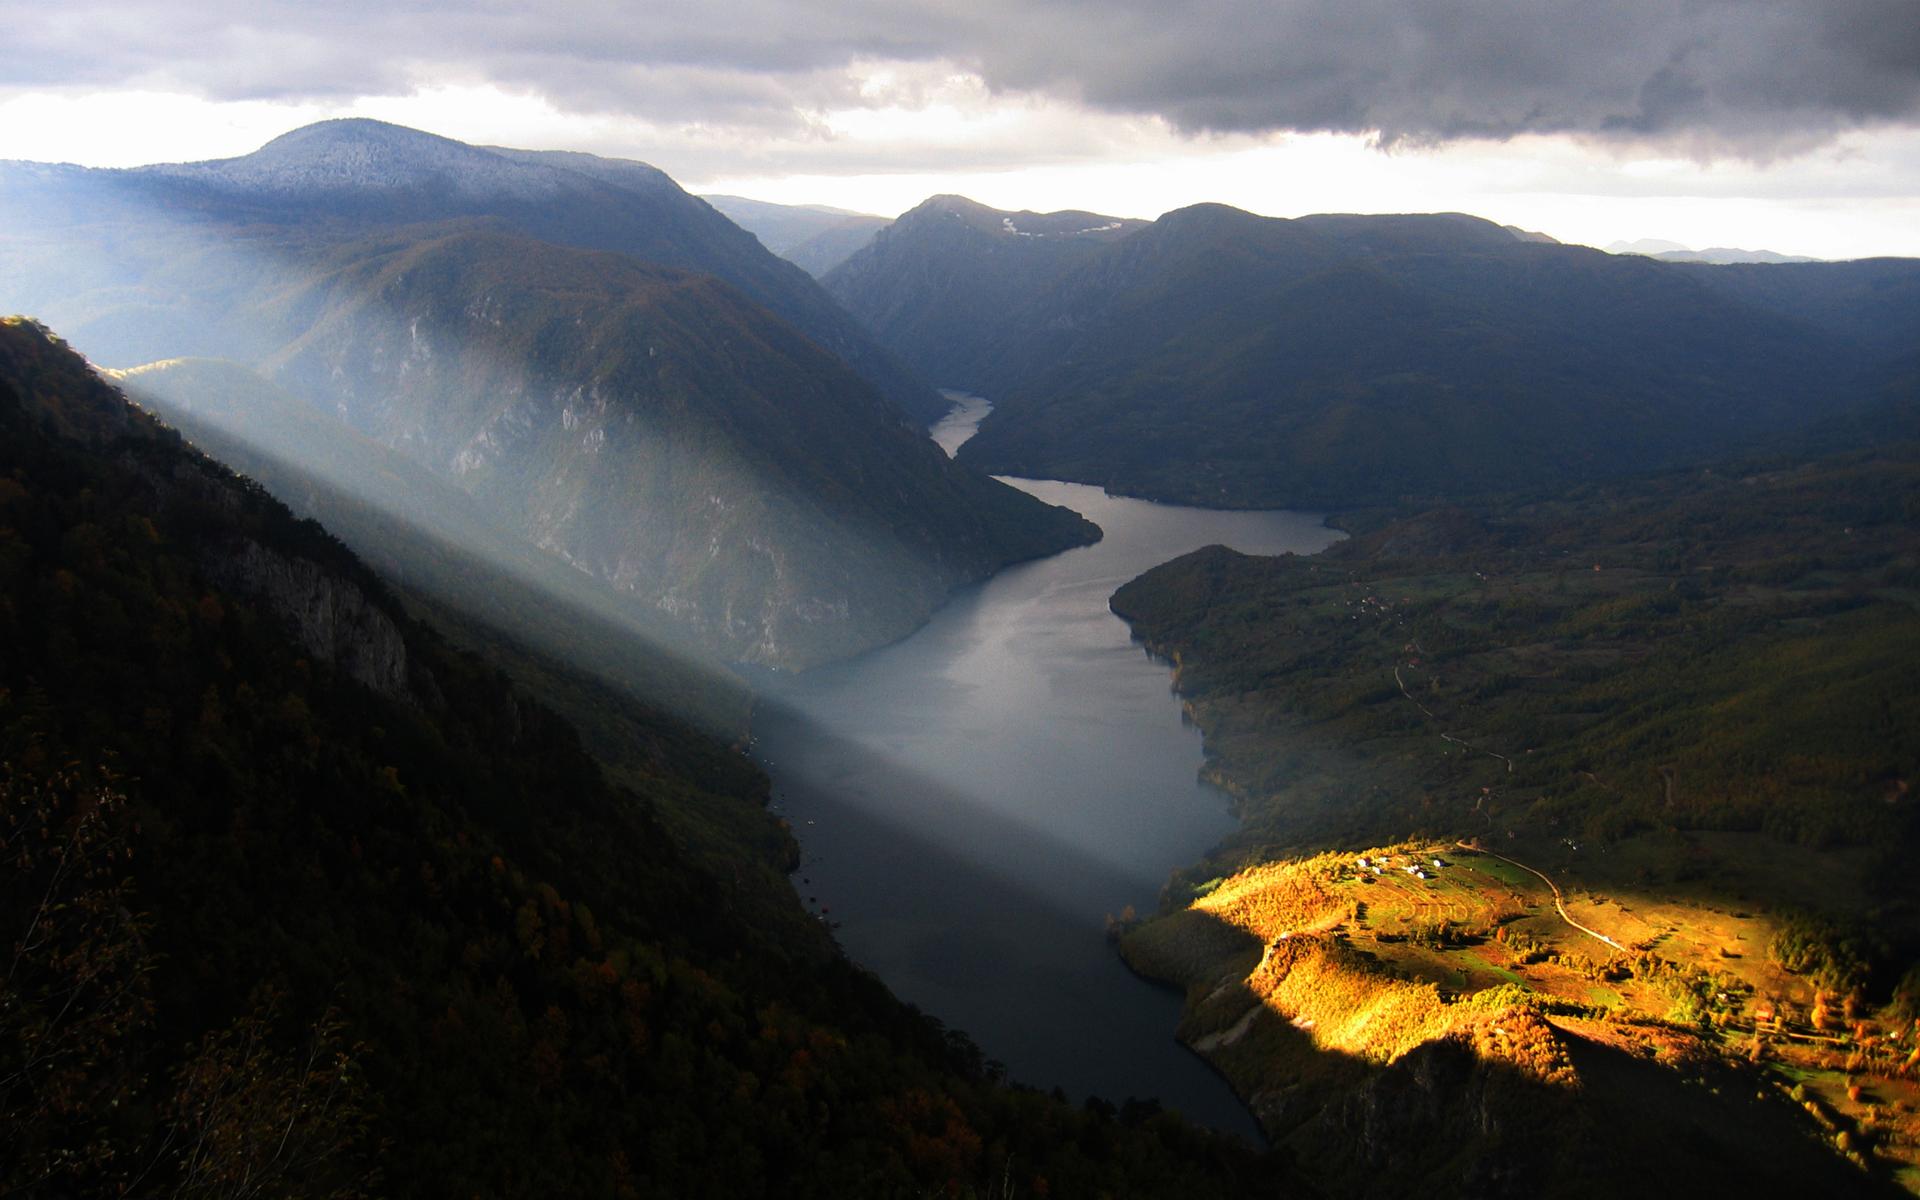 Lampa - Tara mountain